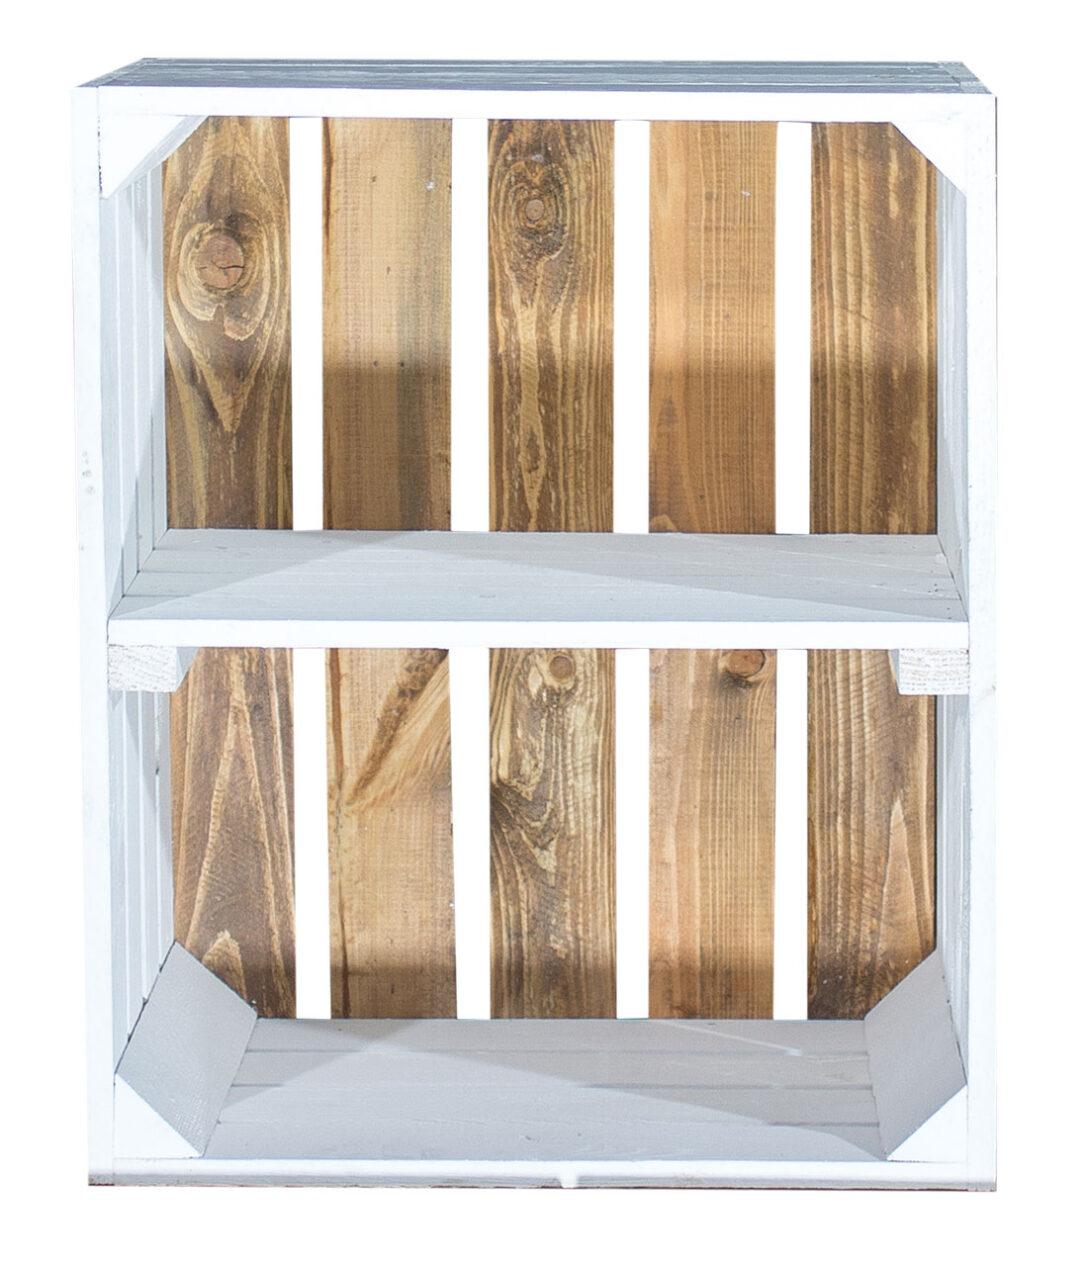 Large Size of Regal Kisten System Aus Holzkisten Selber Bauen Ikea Basteln Holz Kaufen Regale Bauanleitung Farbige Weies Apfelkiste Weier Boden 50x40x30cm Rausfallschutz Regal Regal Aus Kisten